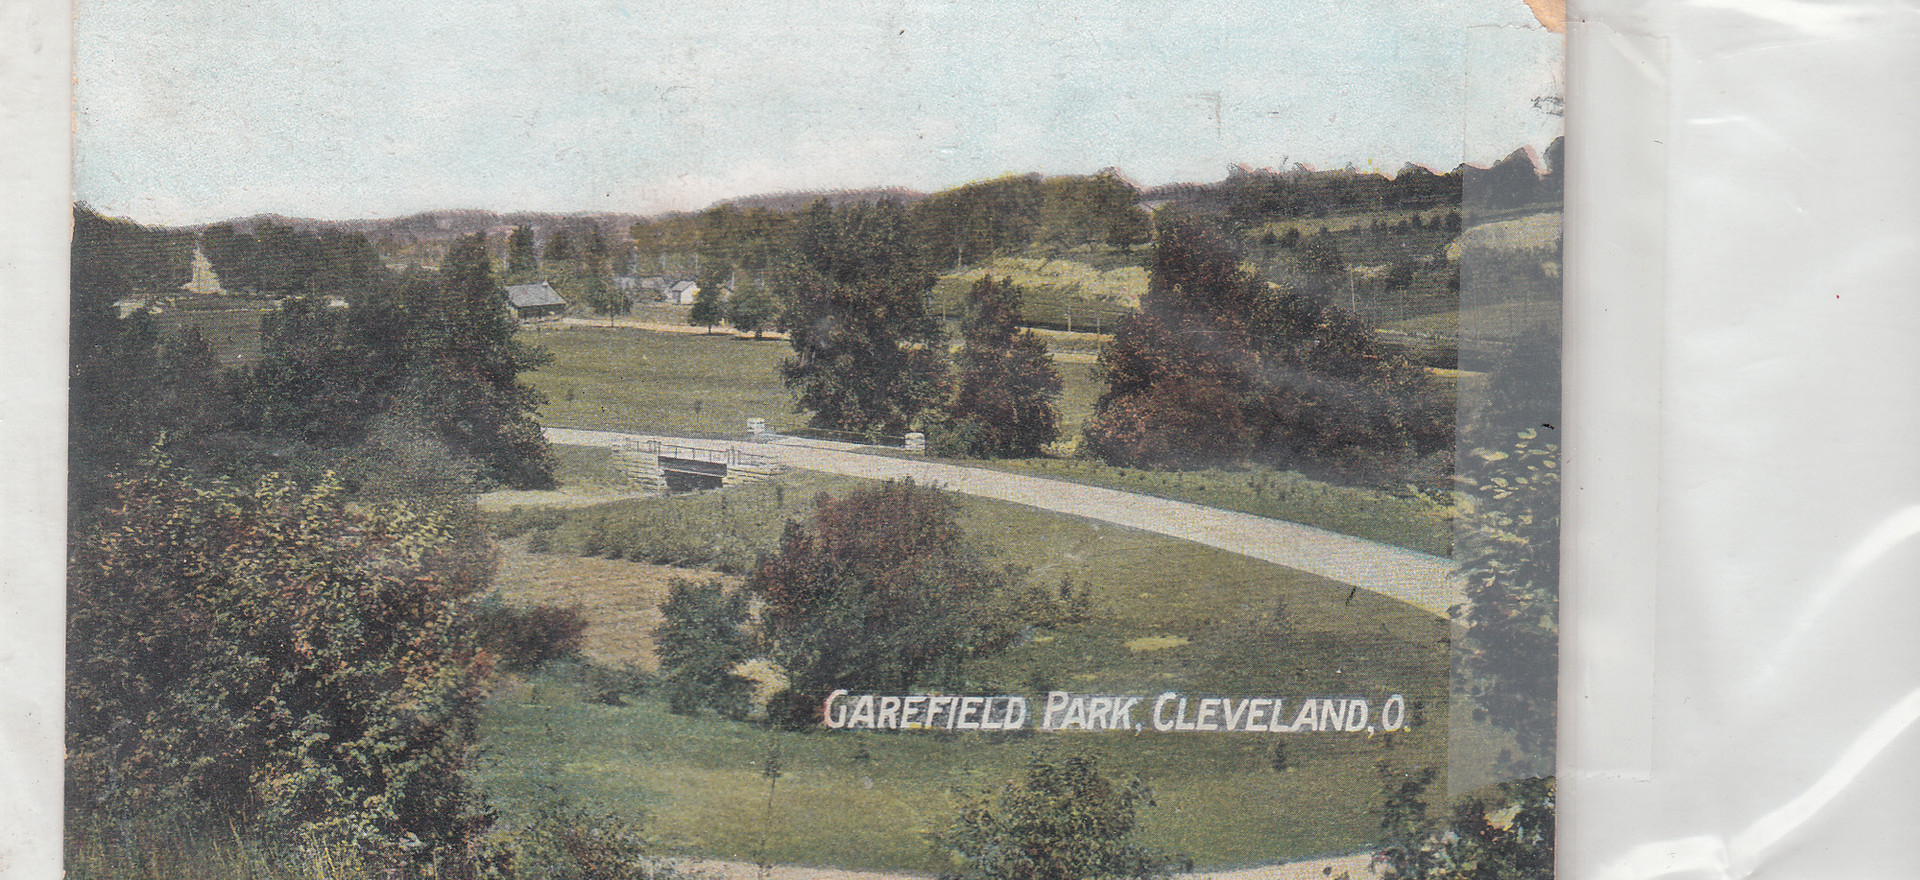 Garfield park 1908 - Copy.jpg